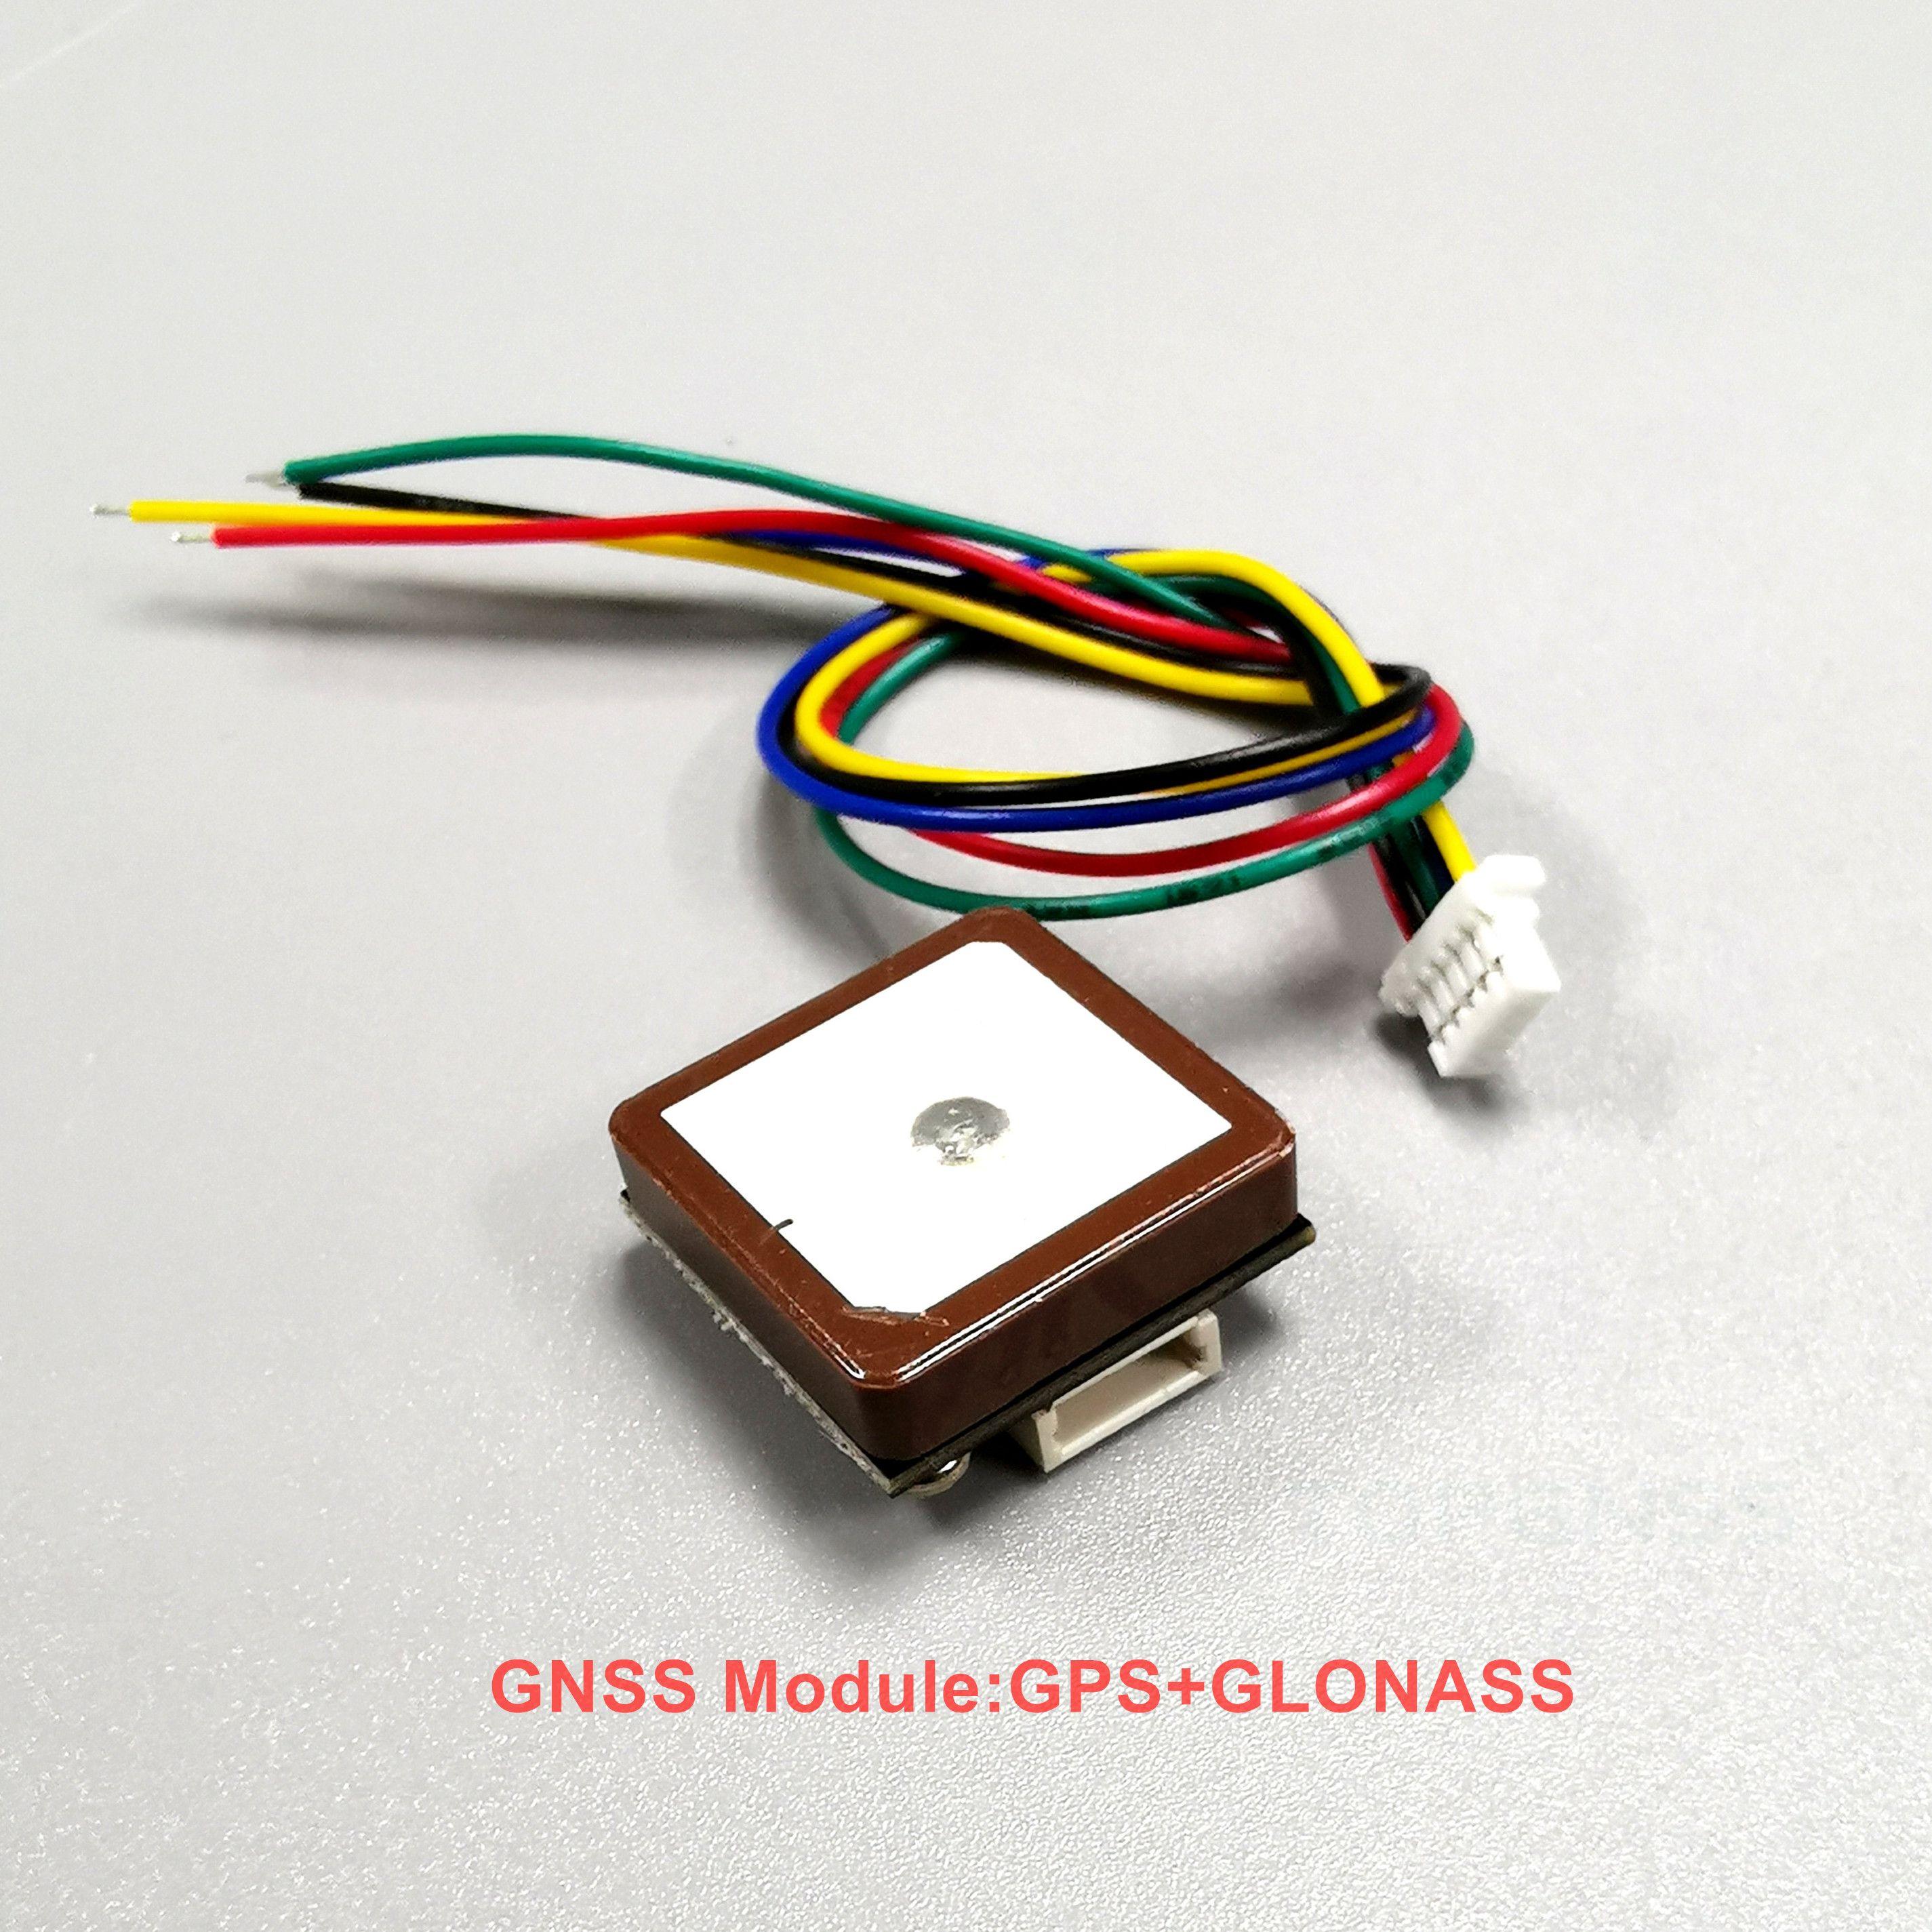 Small size GNSS GPS GLONASS module,GPS receive antenna,neo m8n Solution,GNSS module,Dual GPS Module,UART TTL level,GG-1802